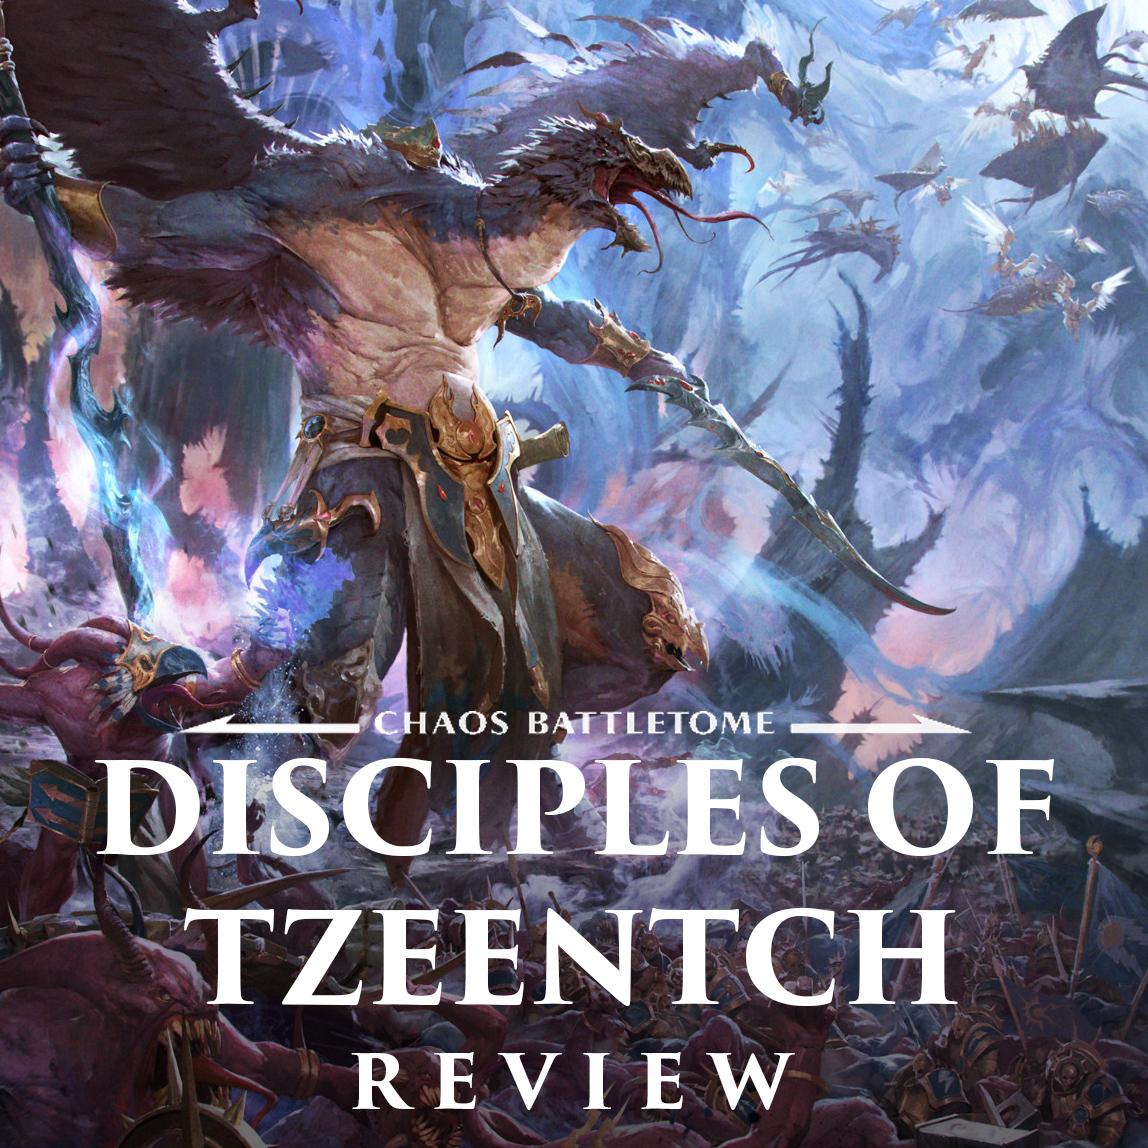 REVIEW: Disciples of Tzeentch Battletome